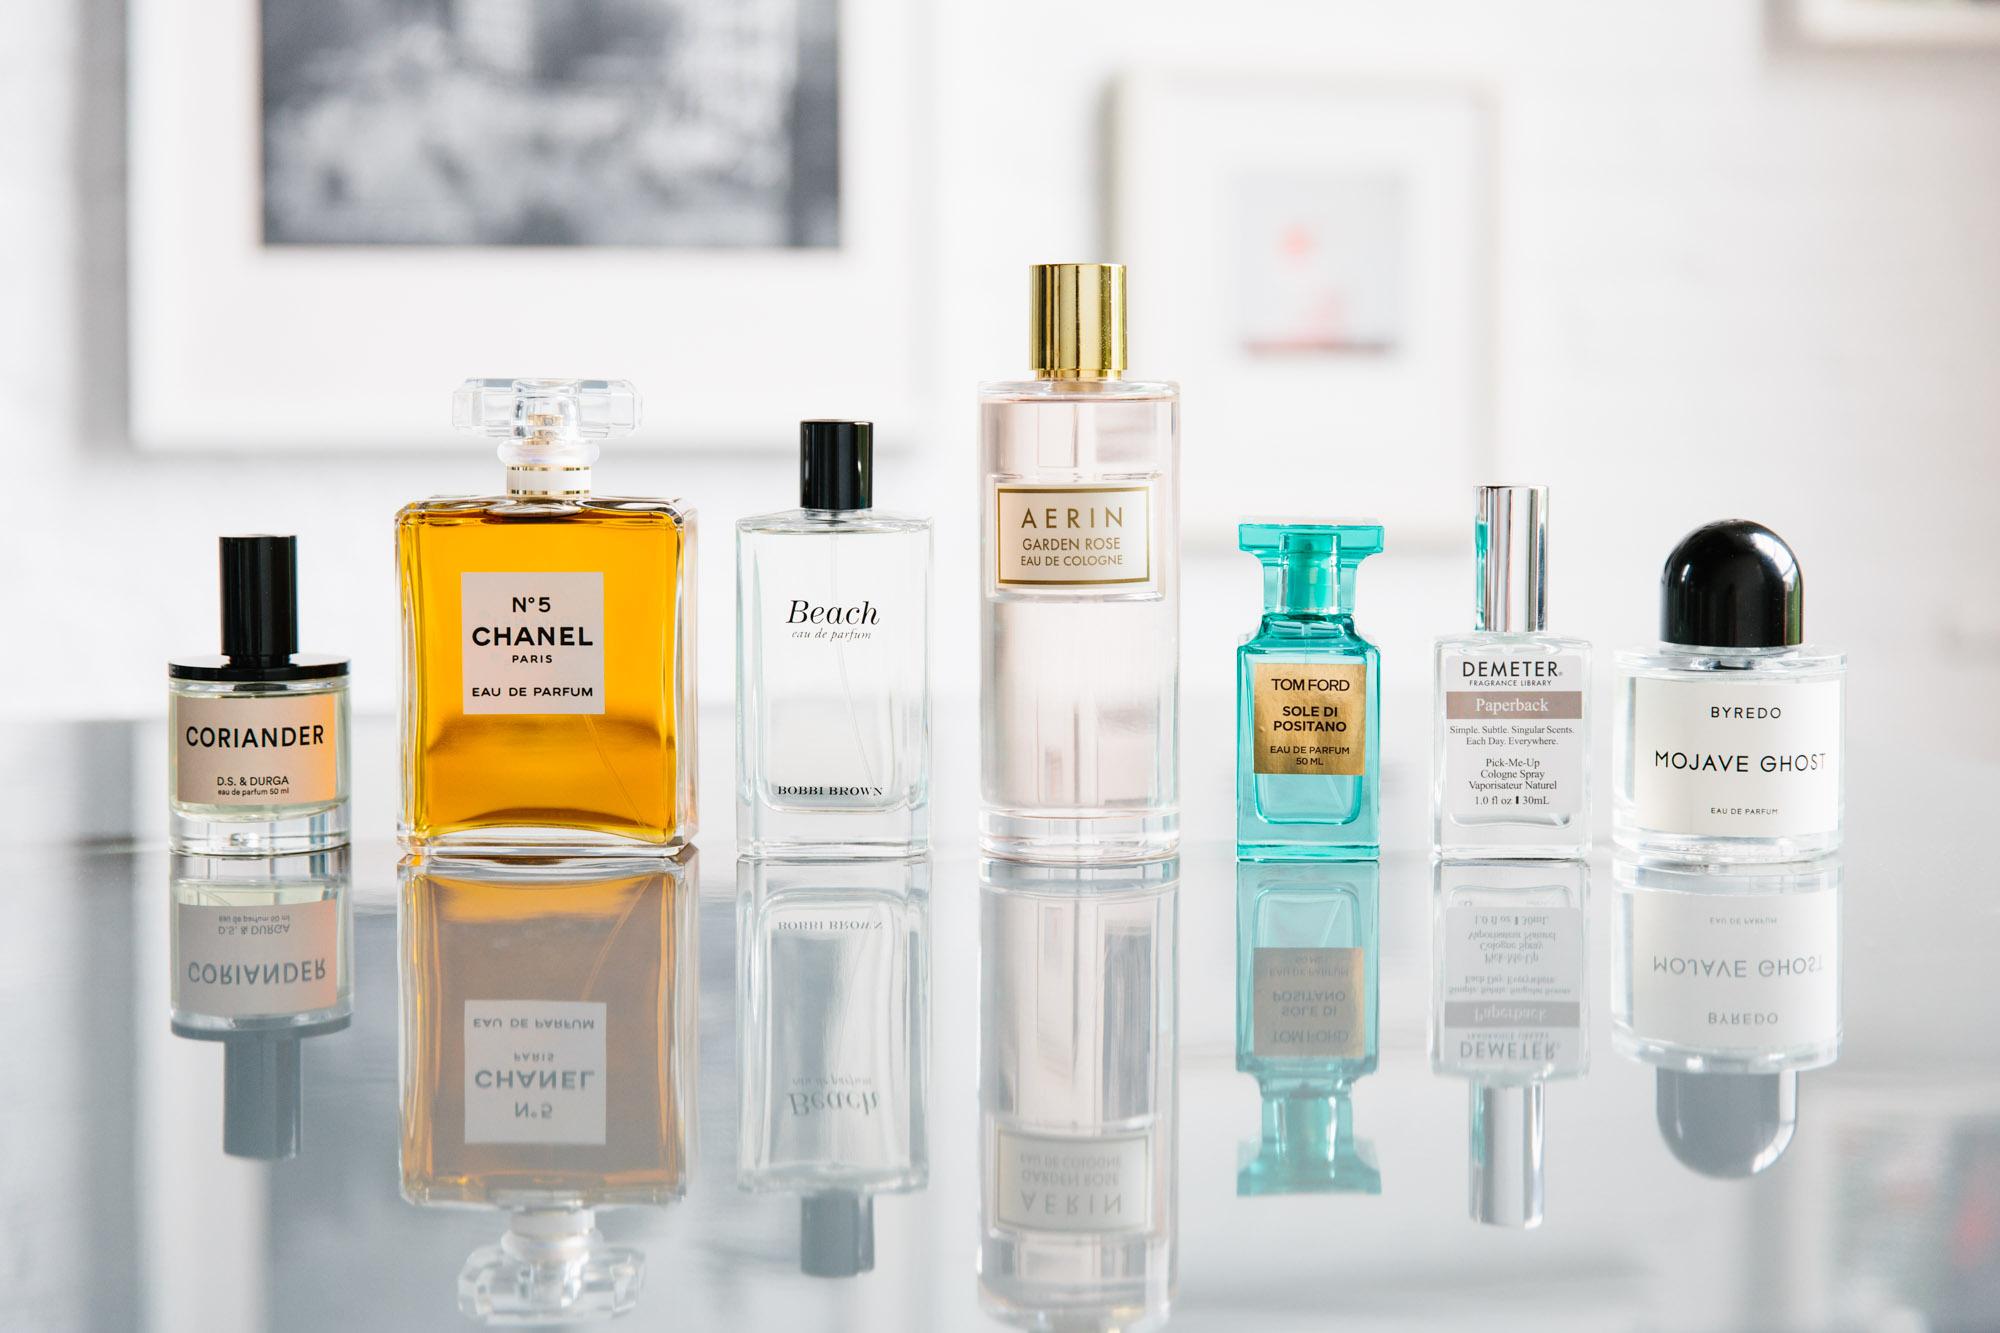 Collection of men's fragrances